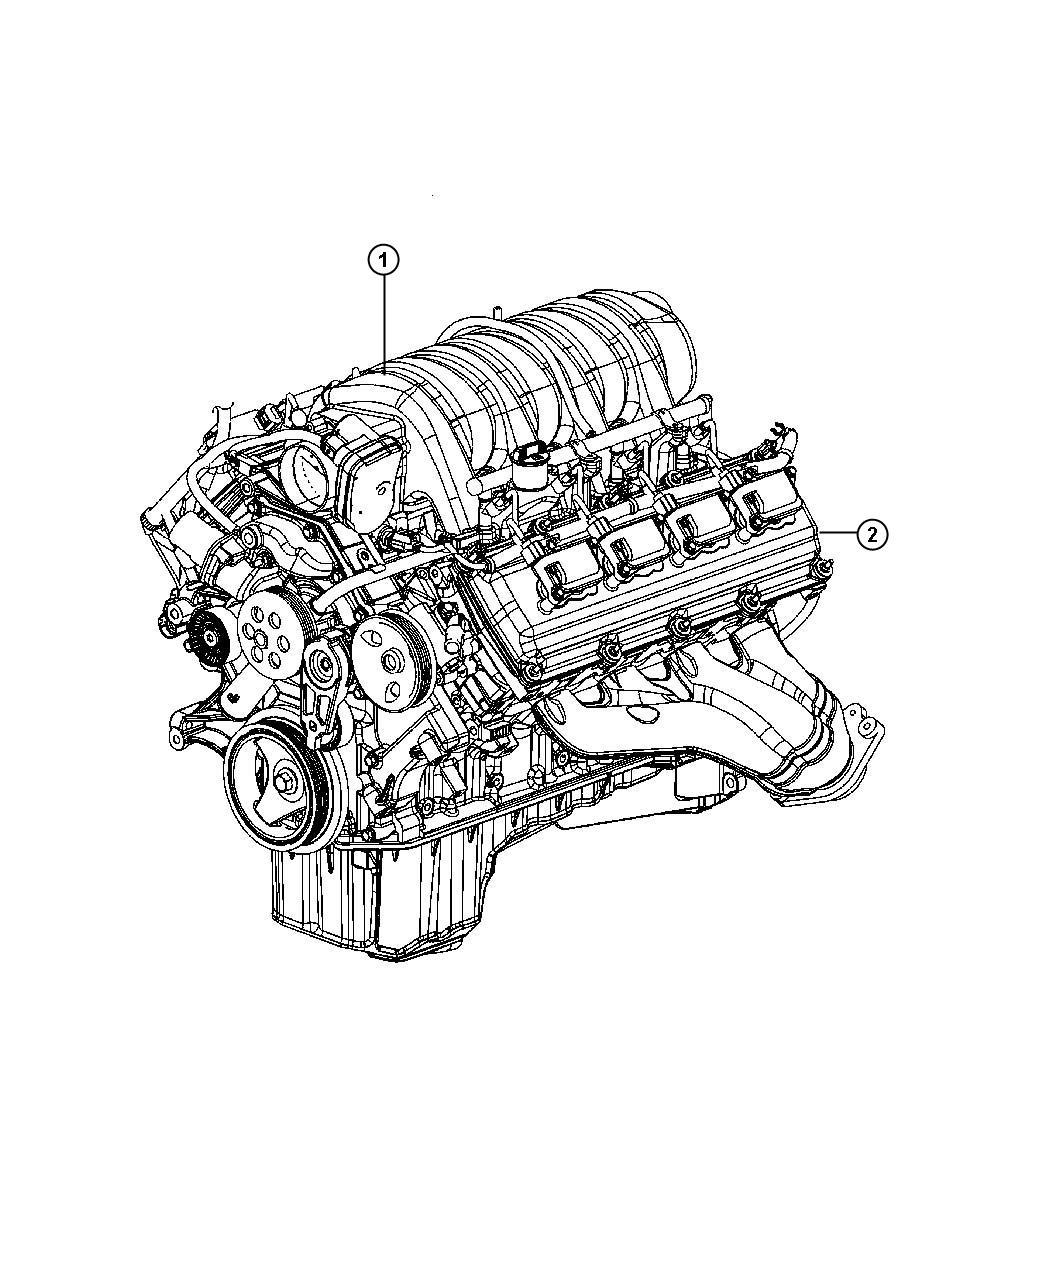 2010 Dodge Charger Engine. Long block. Remanufactured